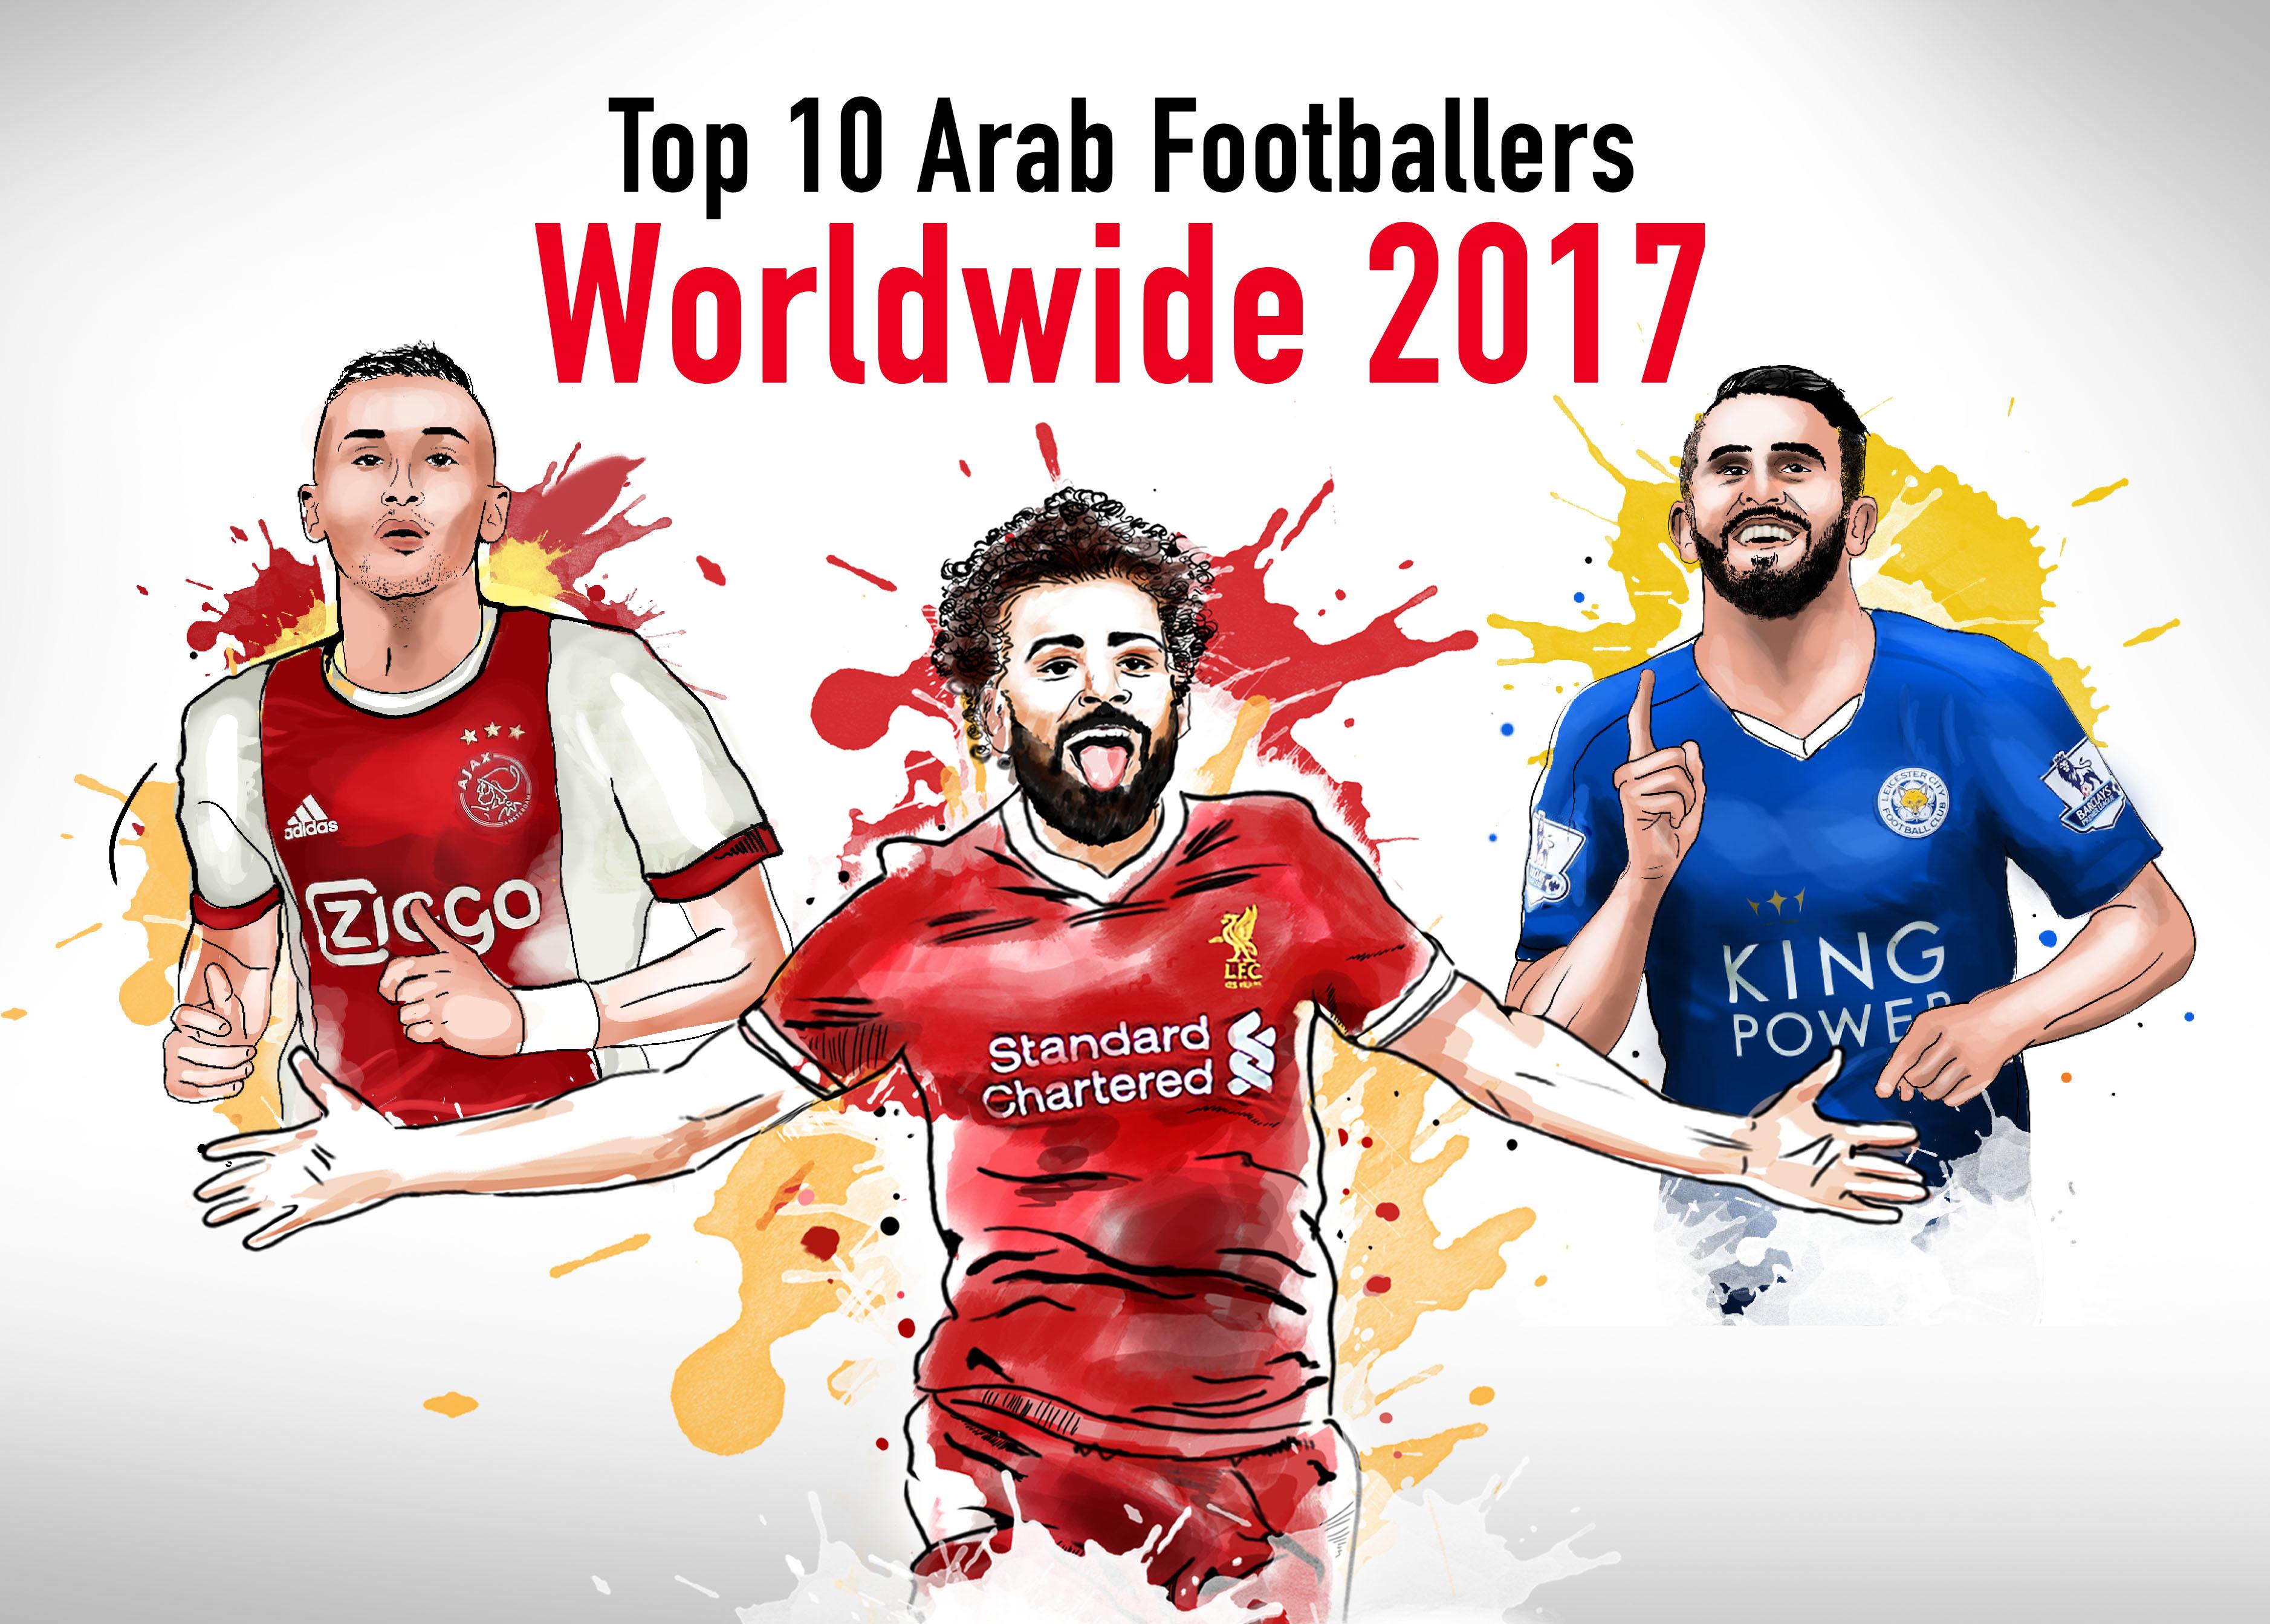 Top 10 Arab Football Players Worldwide 2017